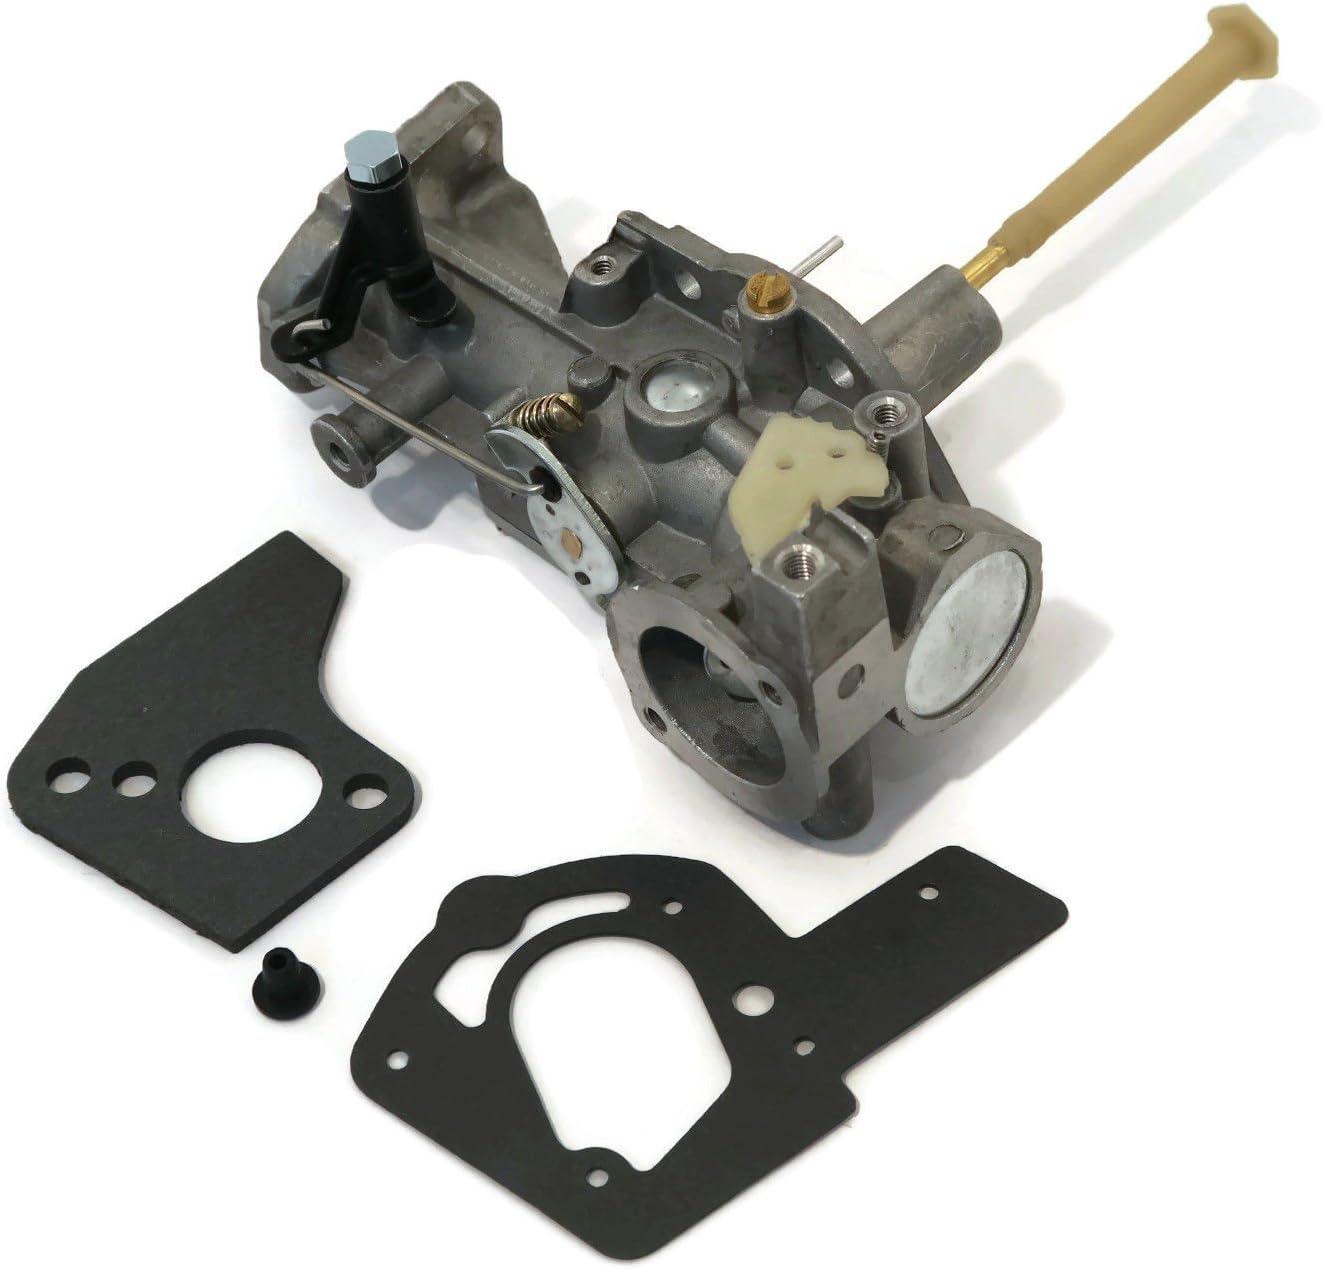 The ROP Shop Carburetor & GASKETS for Briggs Stratton Model 135232 135237 135252 135292